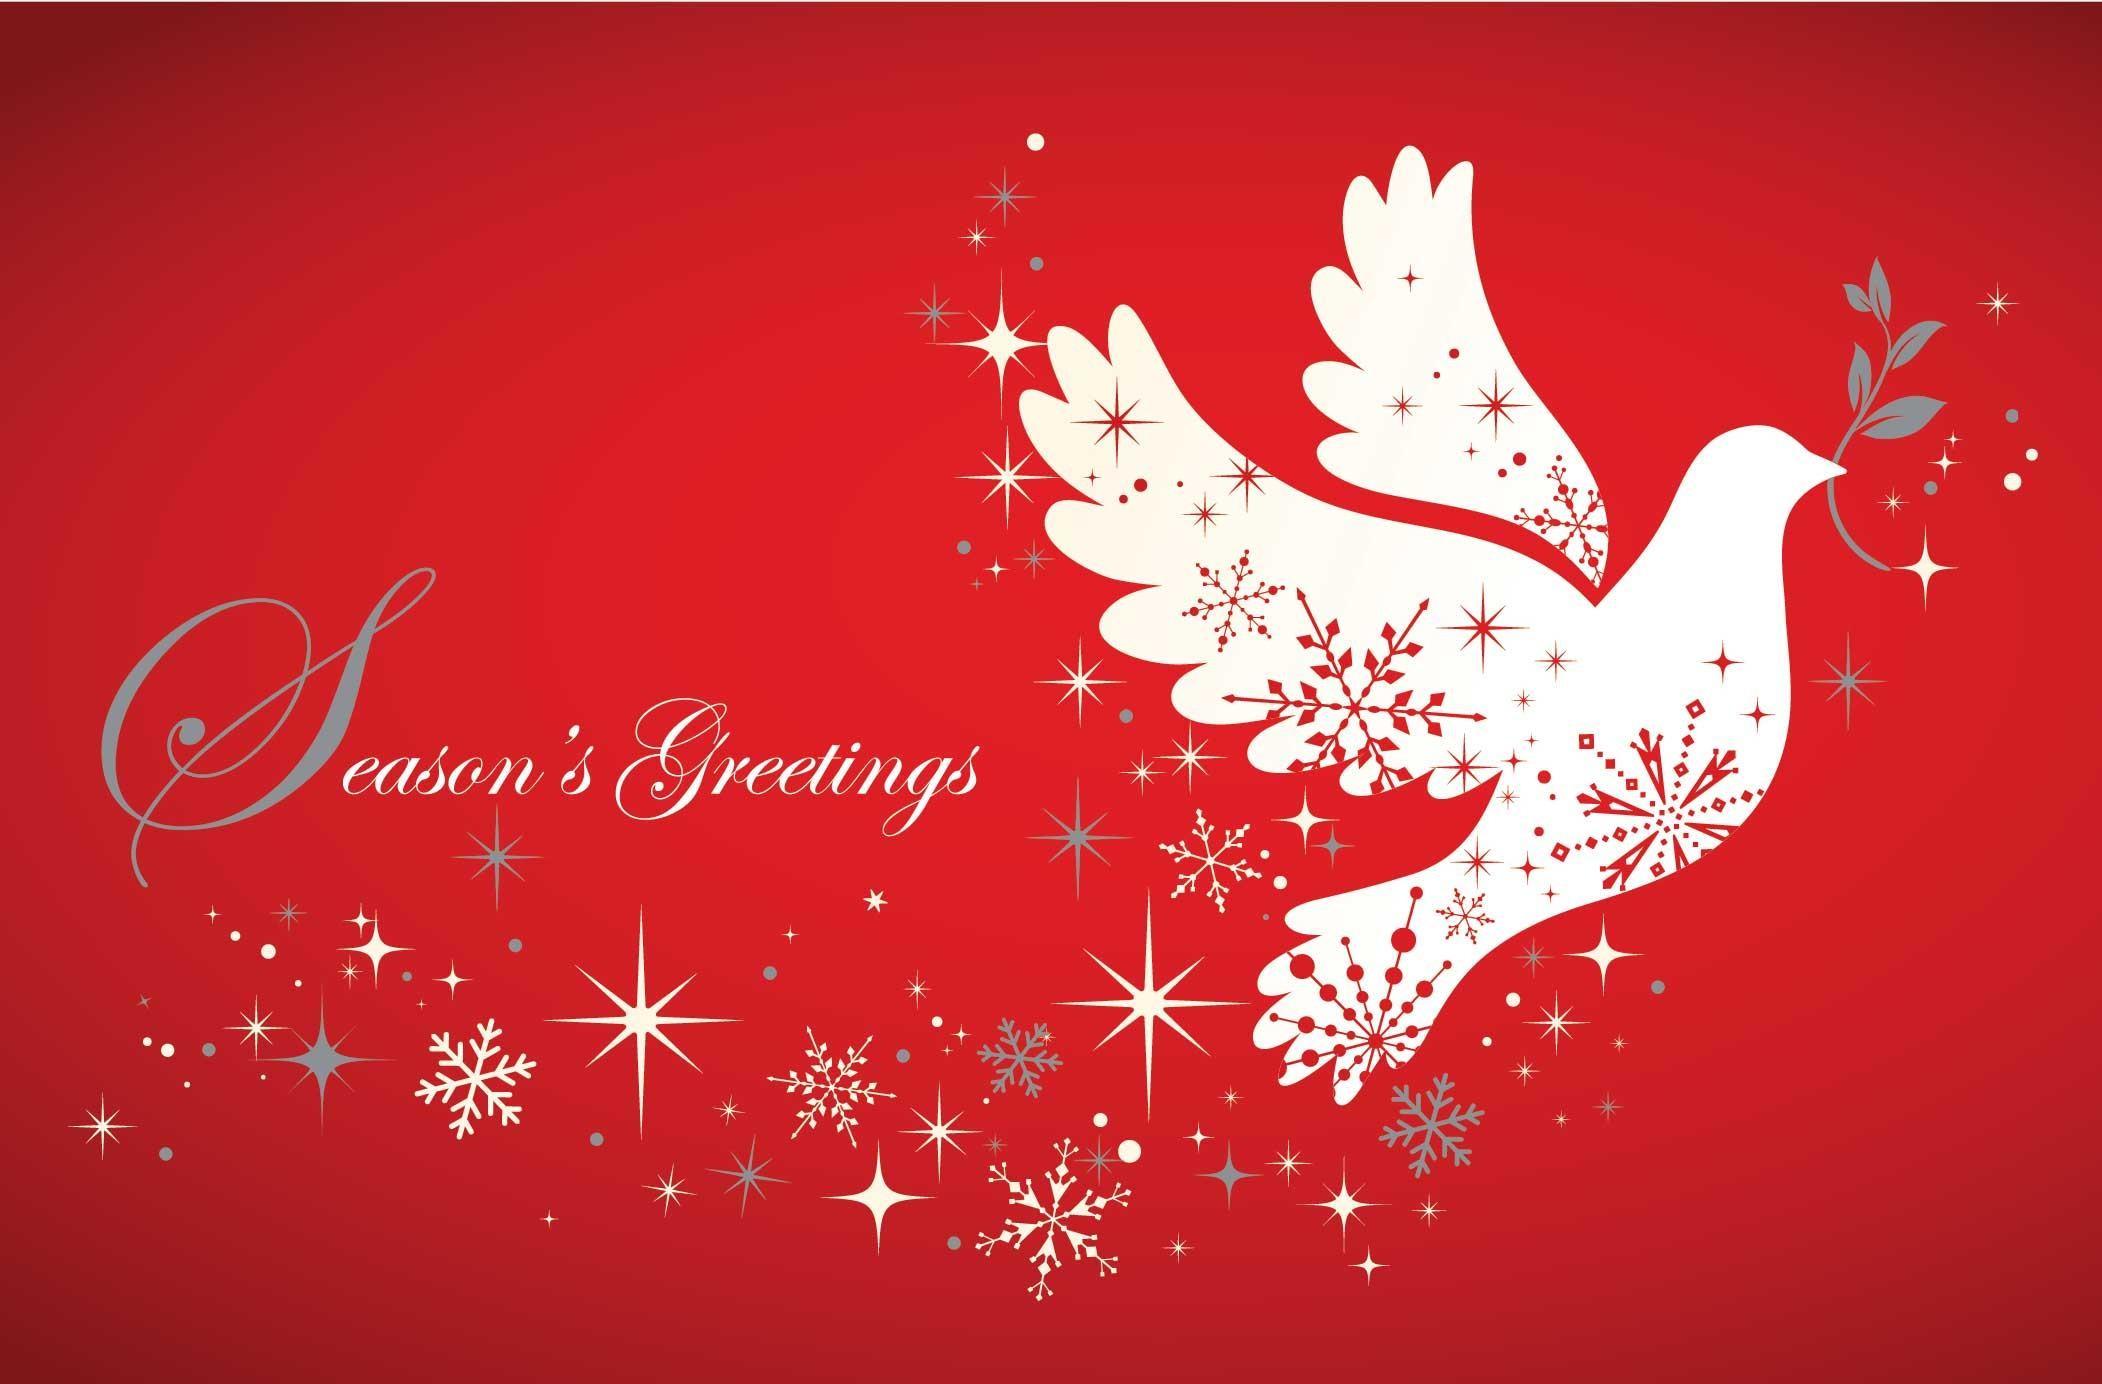 Seasons greetings wallpaper 58 images 2102x1384 seasons greetings message m4hsunfo